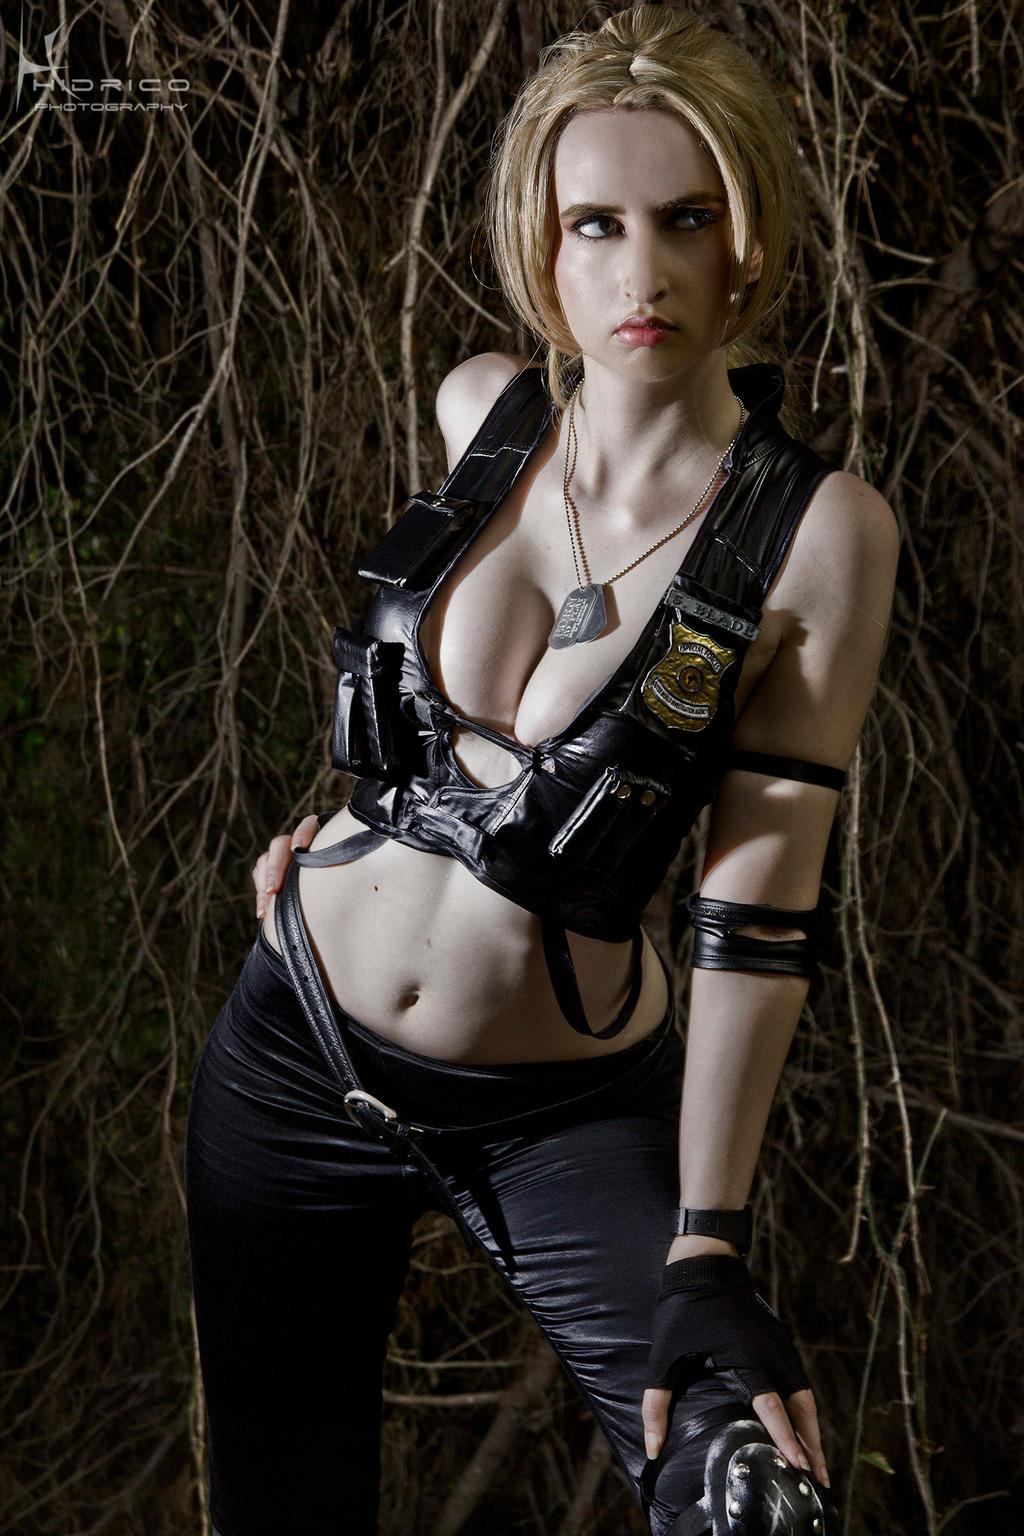 Sonya Blade - Mortal Kombat 9 - II by Hidrico